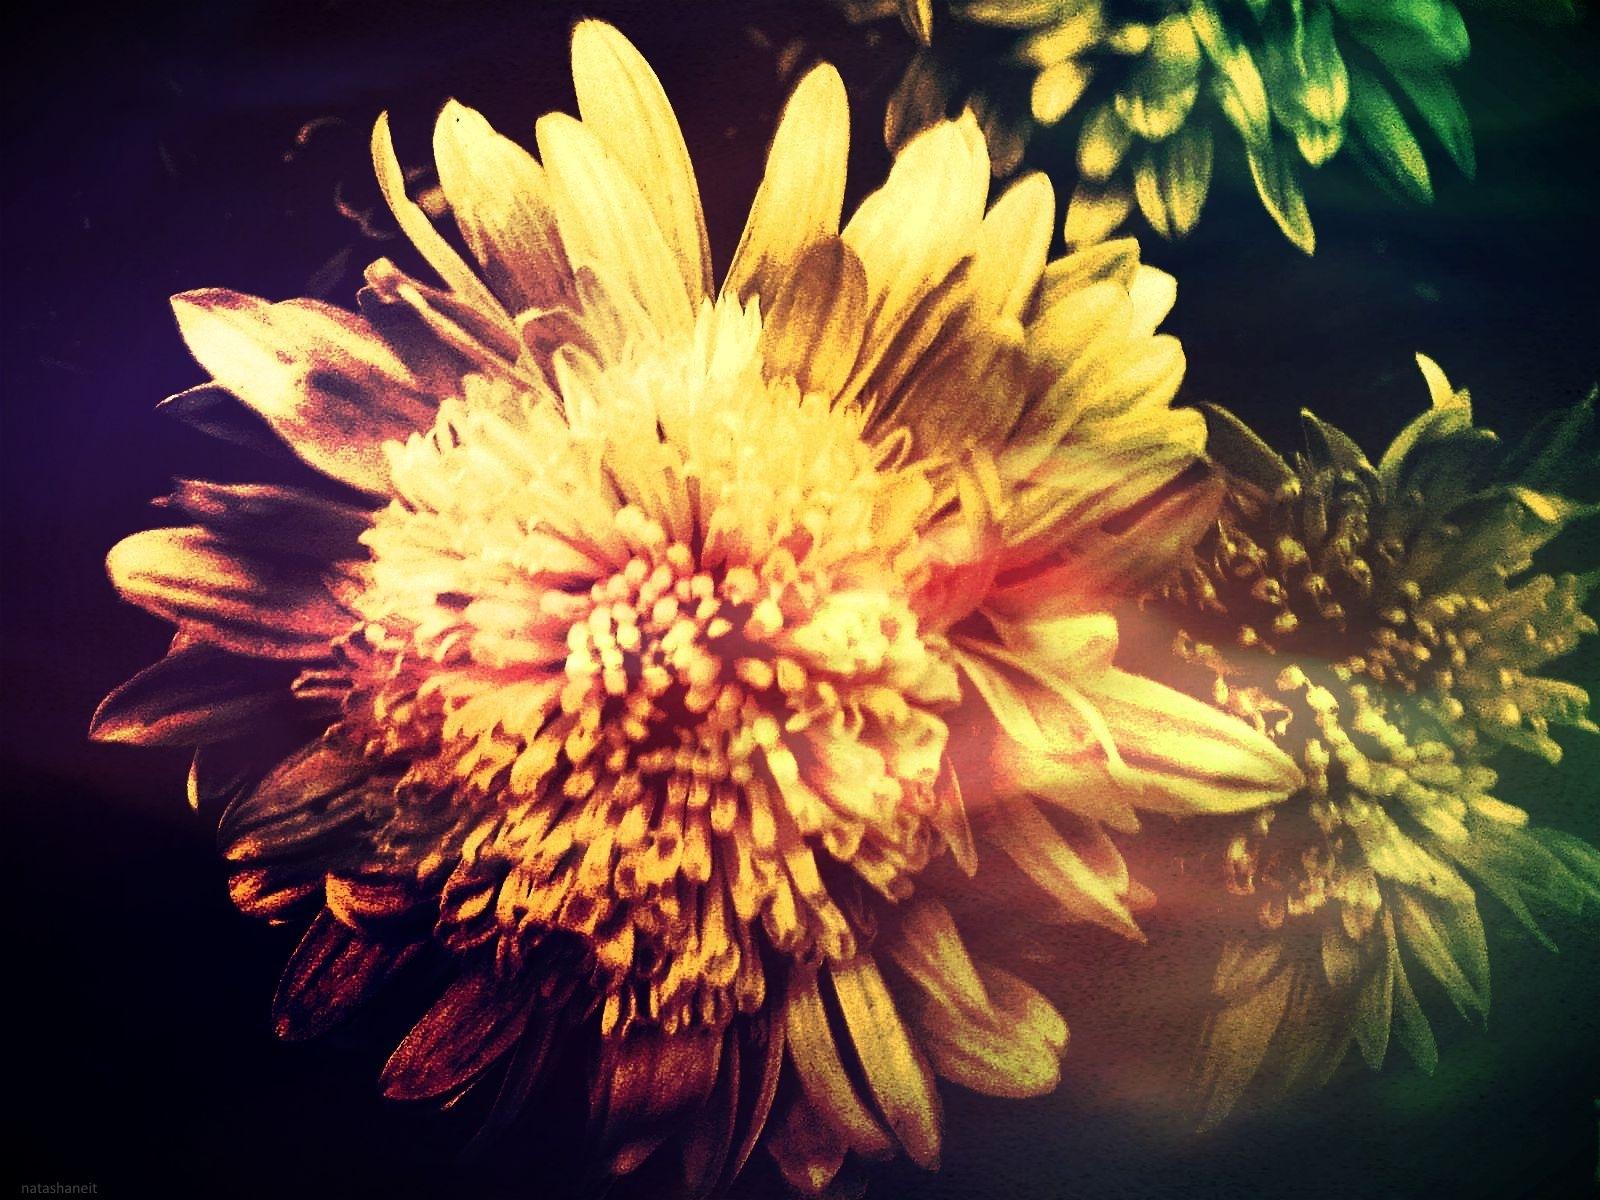 Chrysanthemums by natashaneit